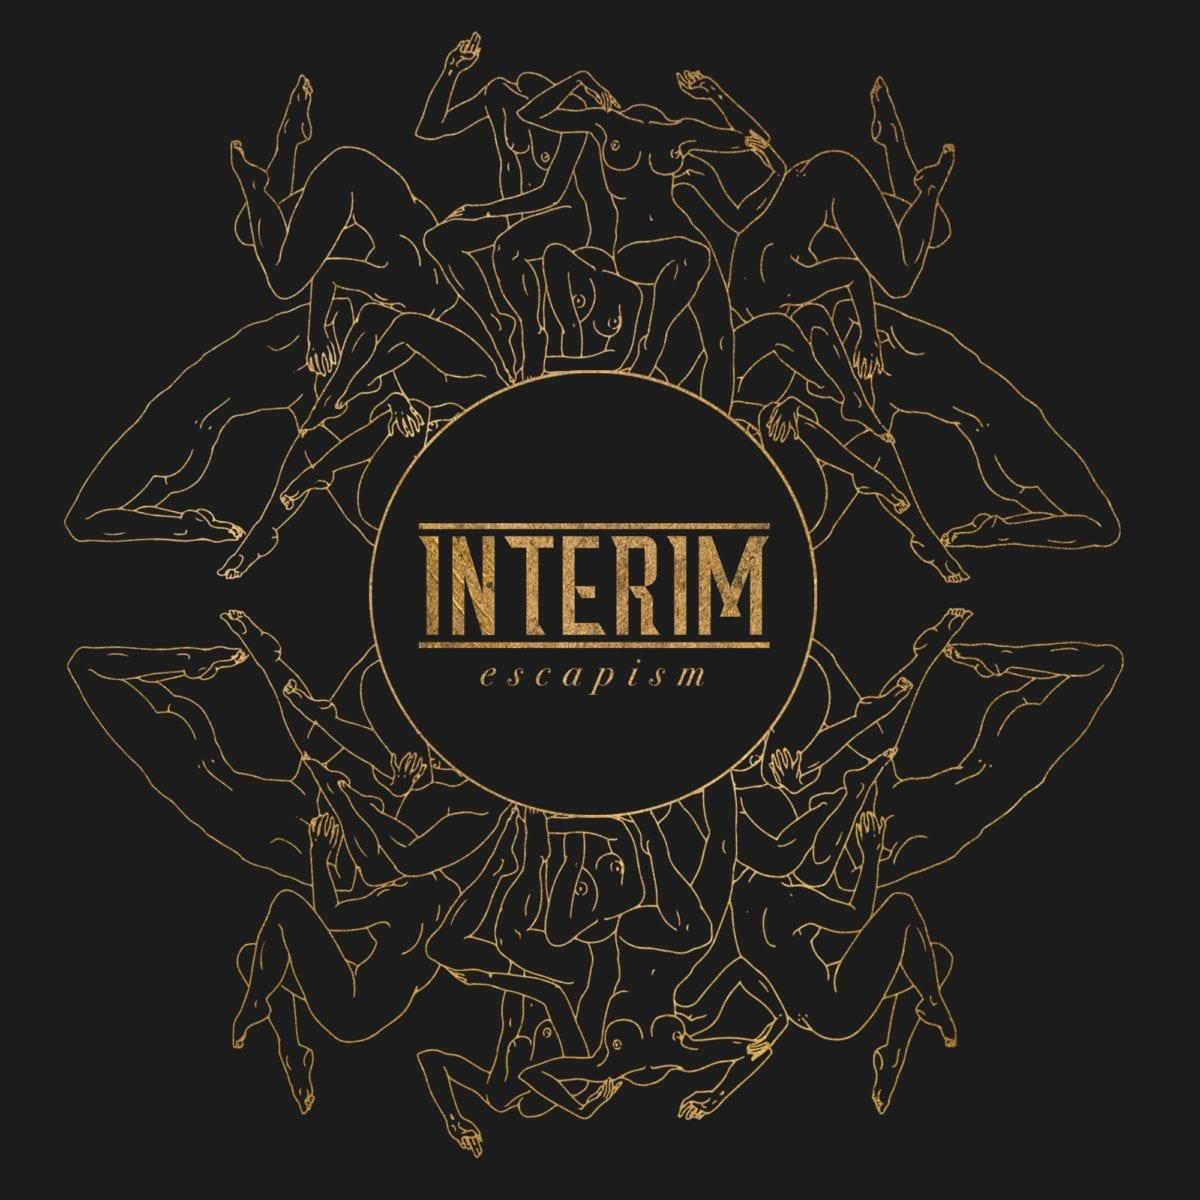 Interim Escapism Cover Art